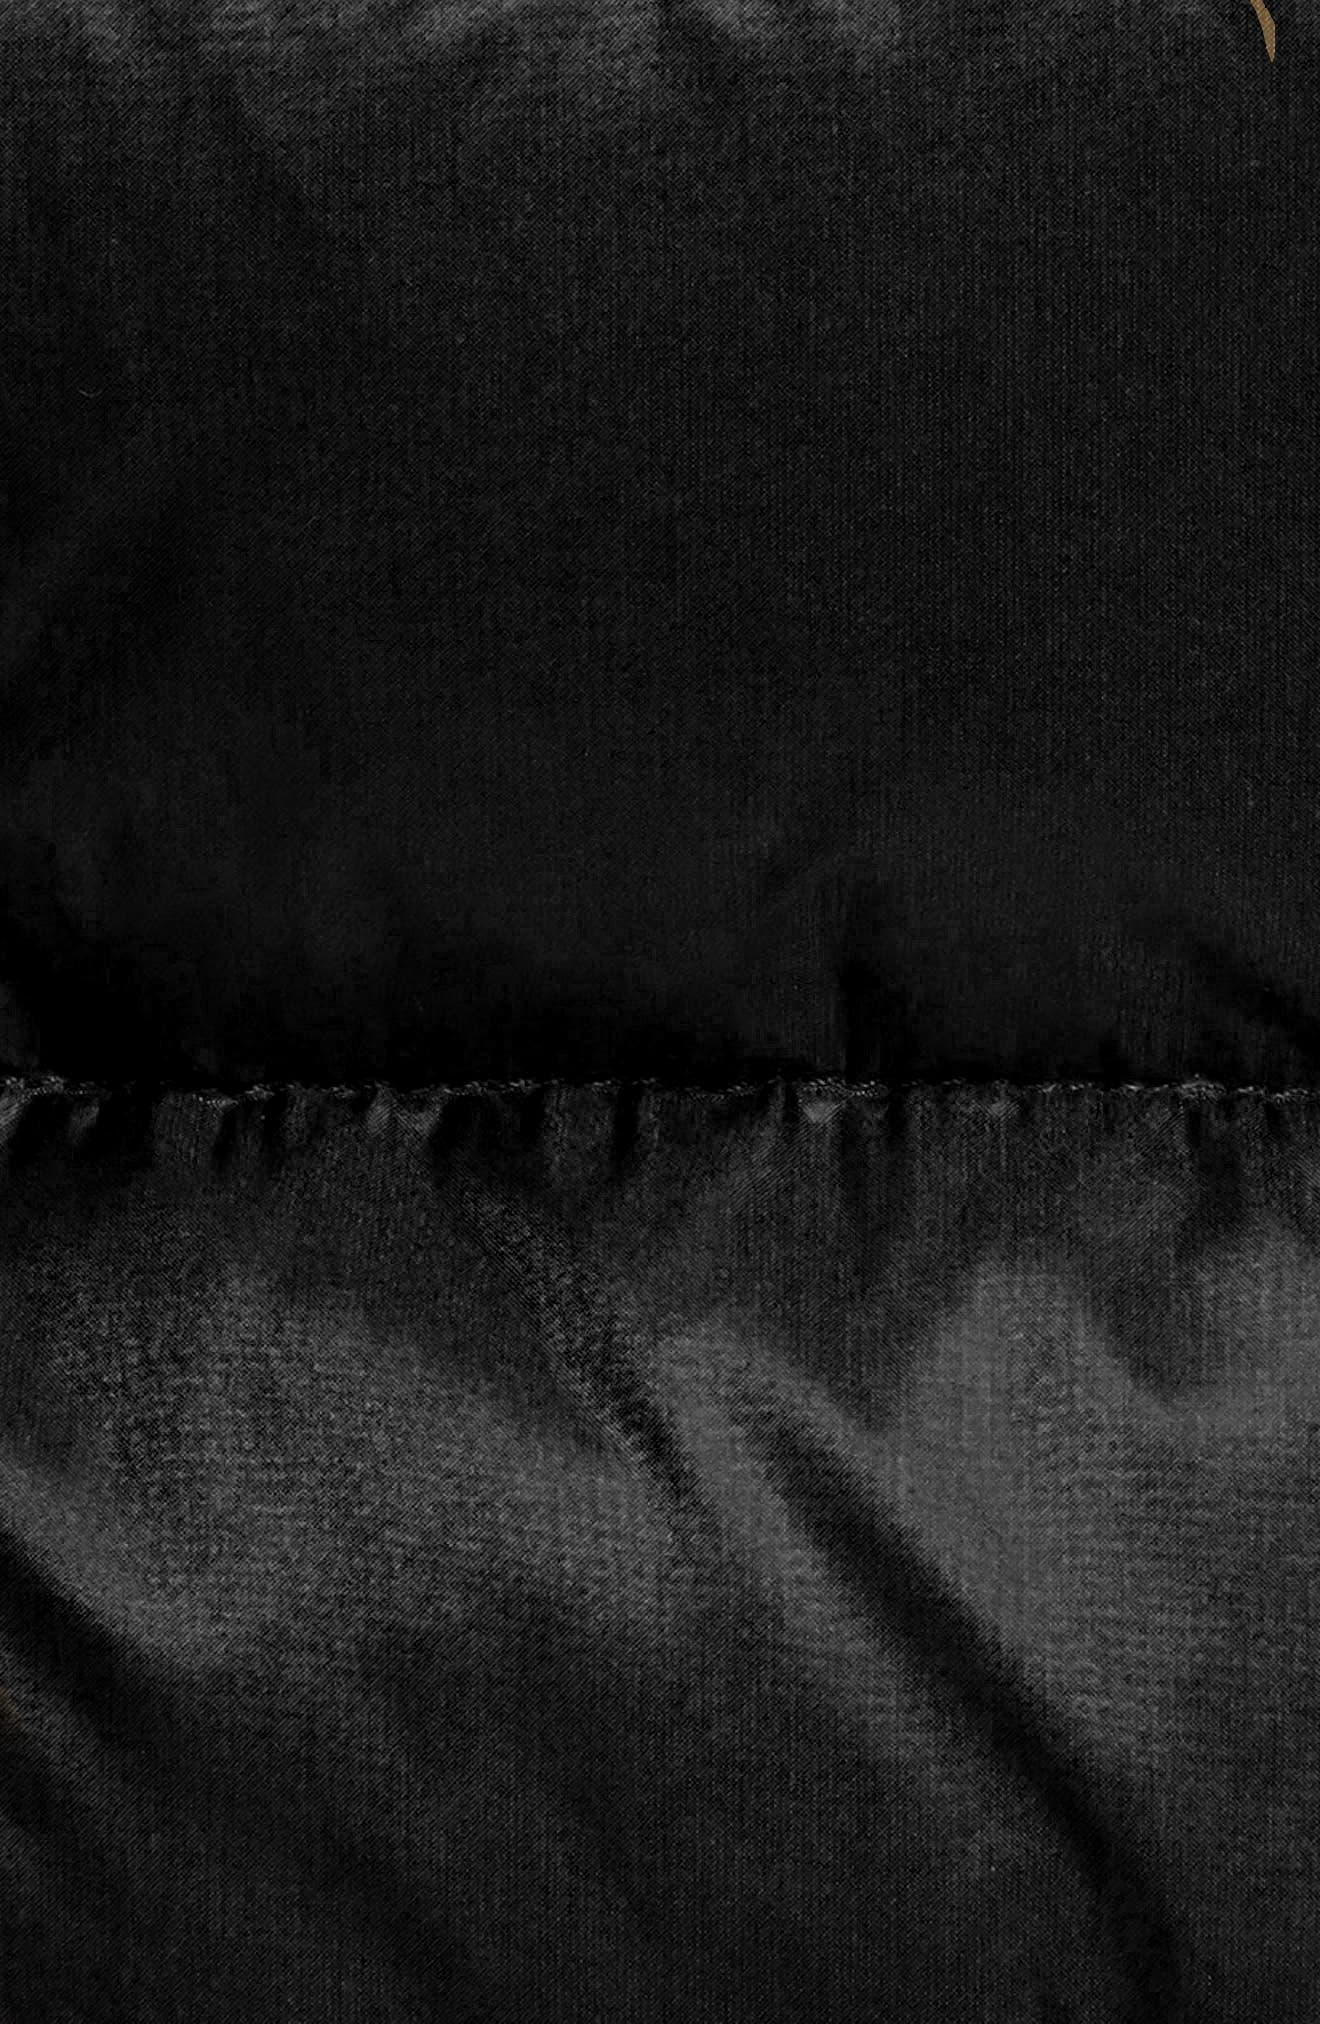 'Hermine' Grosgrain Trim Water Resistant Down Coat,                             Alternate thumbnail 5, color,                             Black